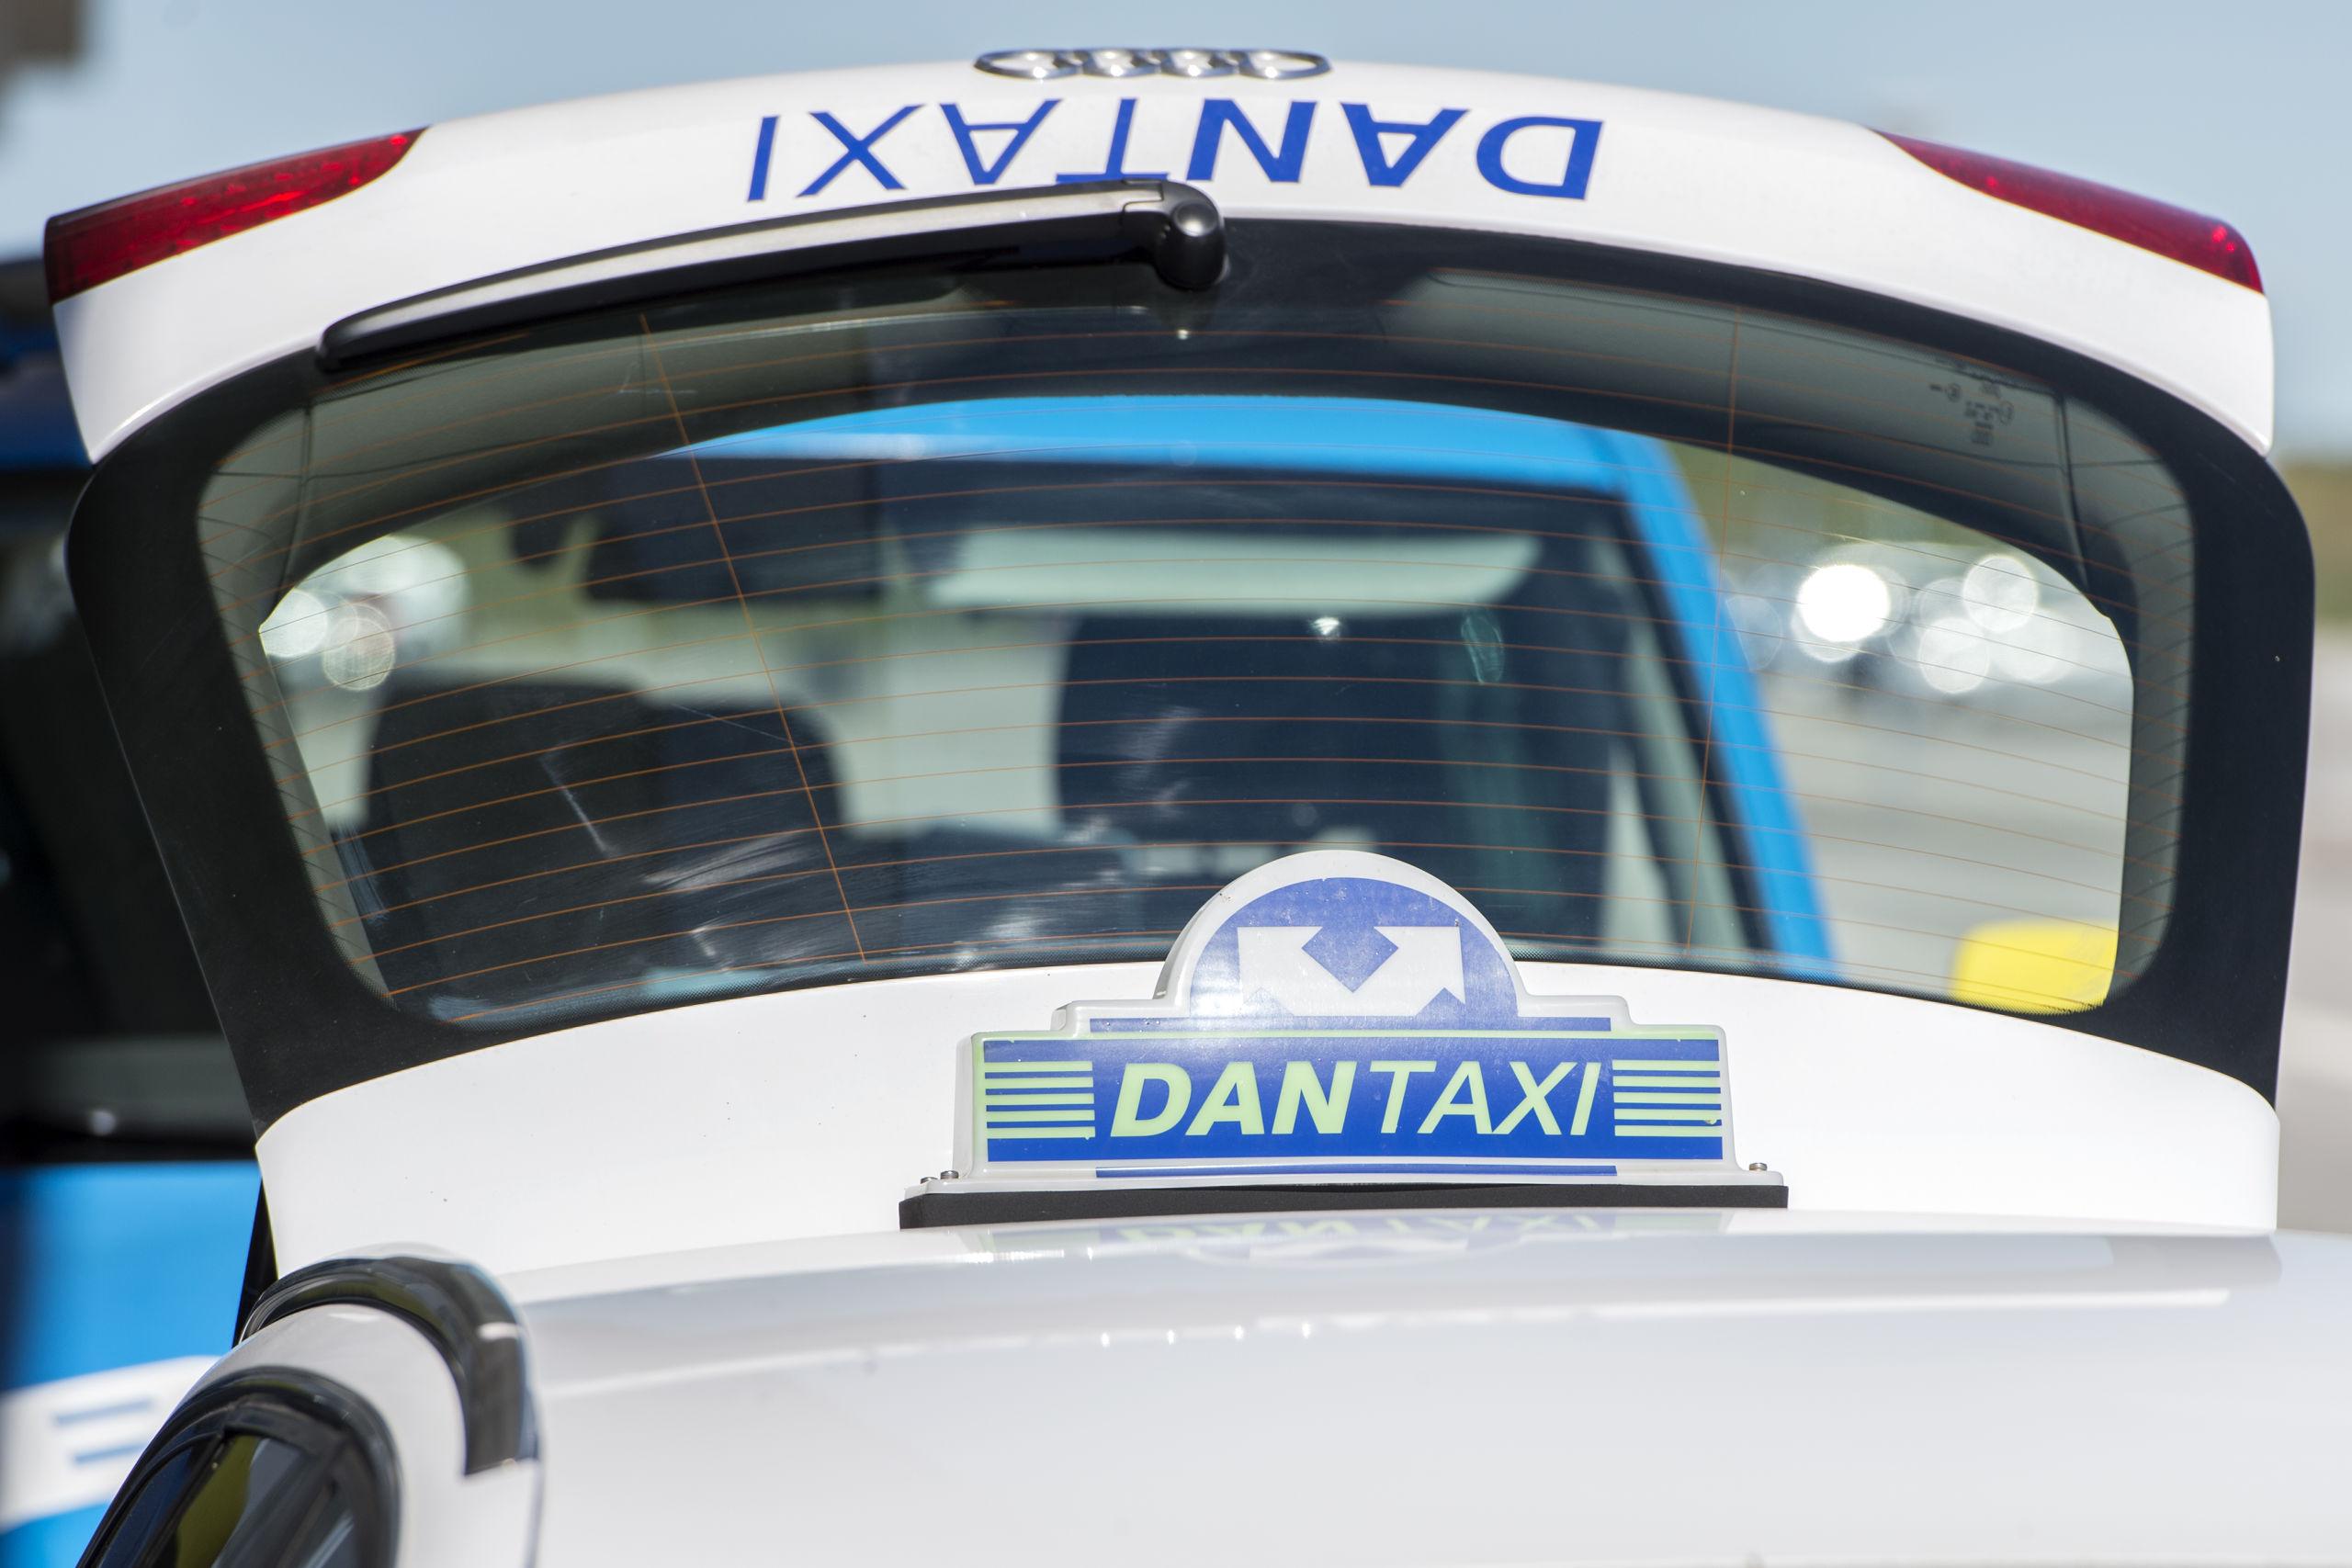 Man kan forhåndsbestille en taxi via f.eks. taxa appen, ligesom man også kan bestille hyrevognen gennem MOOVE appen. Arkivfoto: Andreas Falck